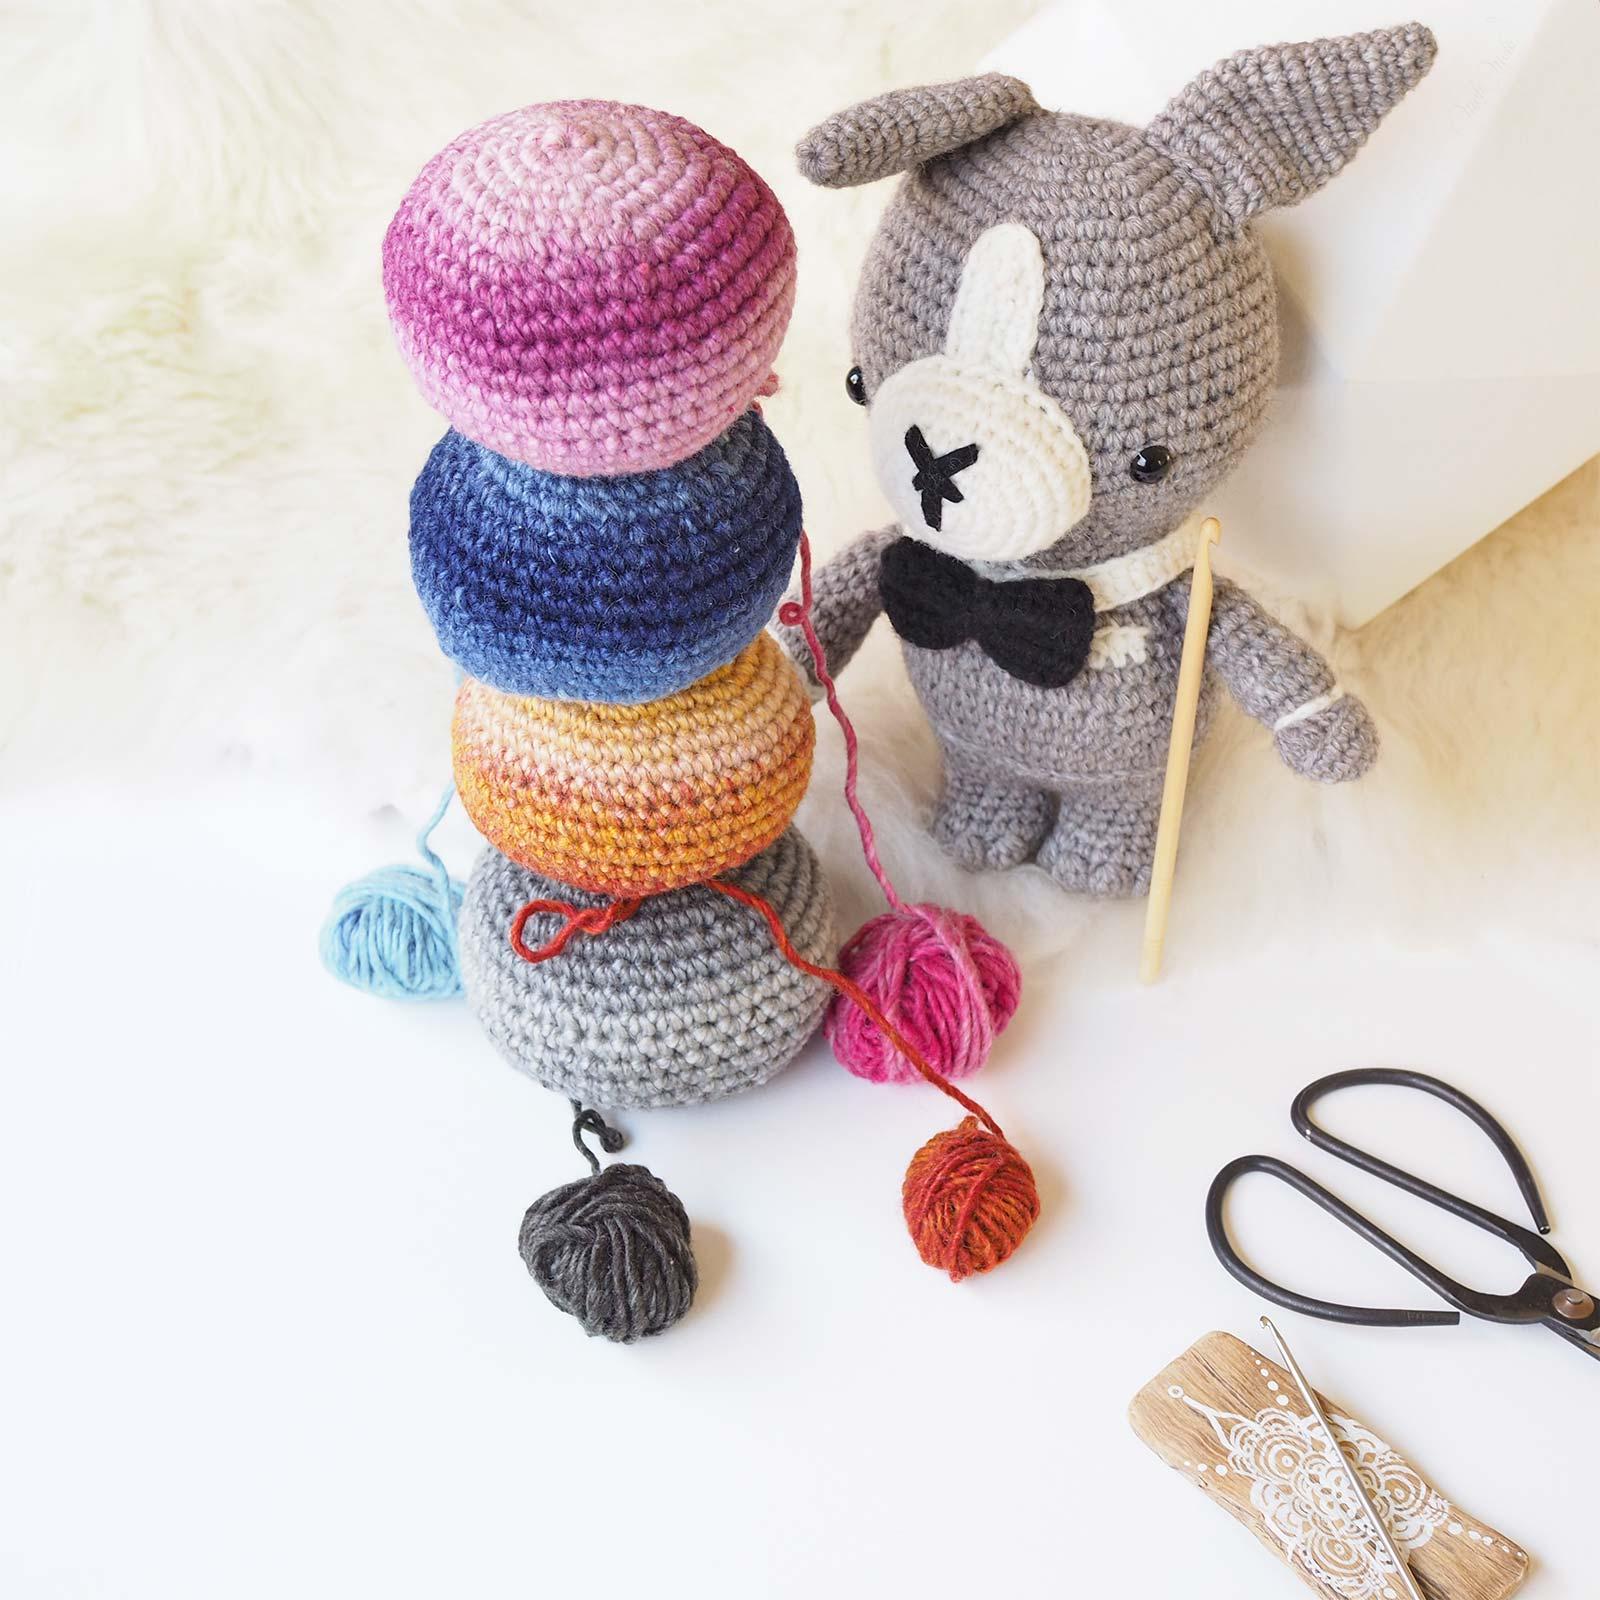 giveaway devinette crochet amigurumis chien dog Bentley laboutiquedemelimelo